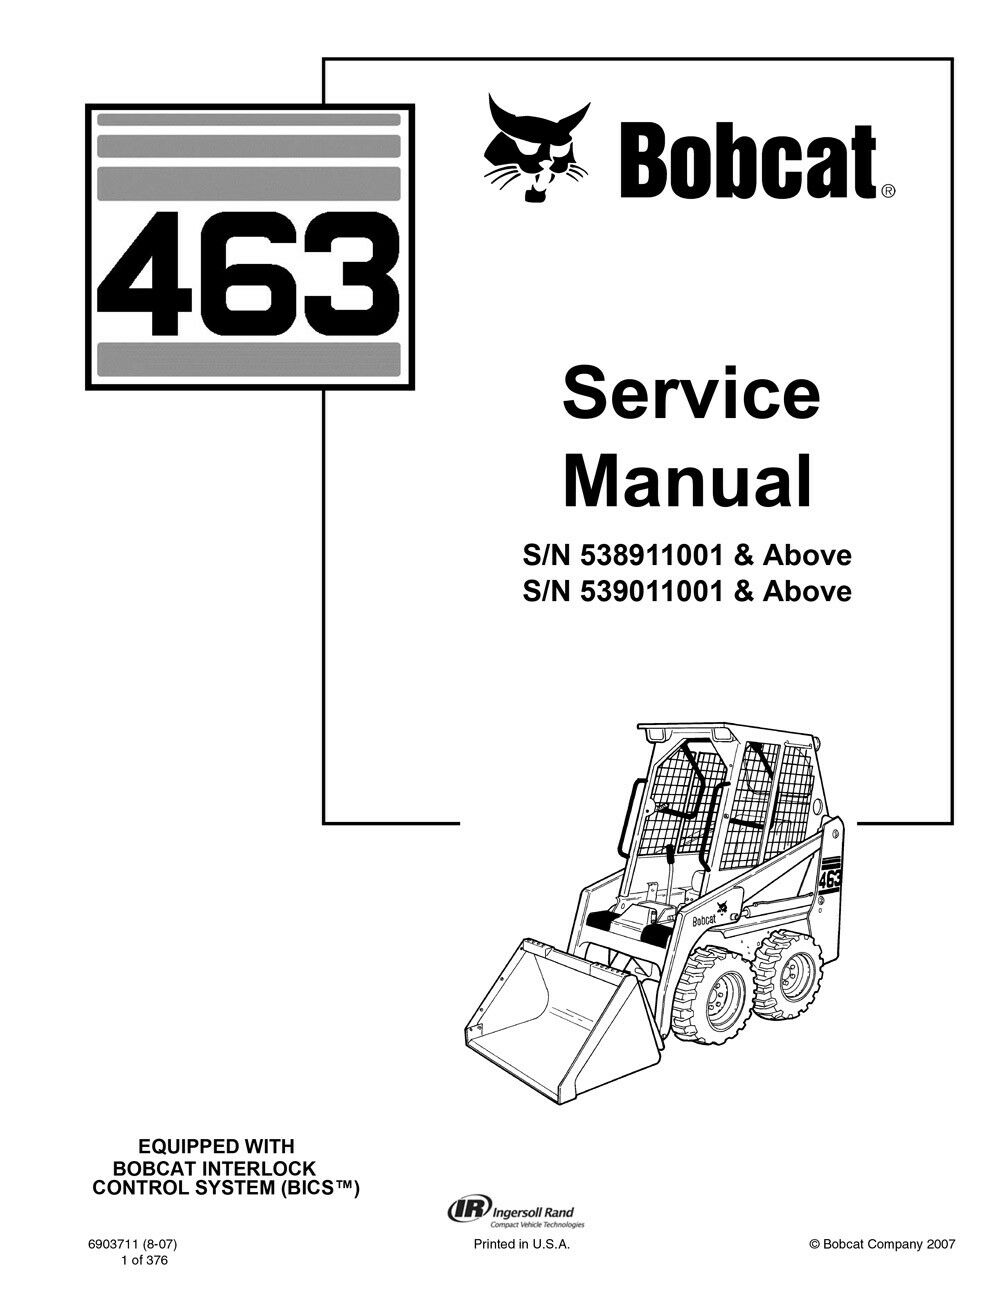 Diagram 743 Bobcat Wiring Diagram Full Version Hd Quality Wiring Diagram Torodiagram Cabinet Accordance Fr